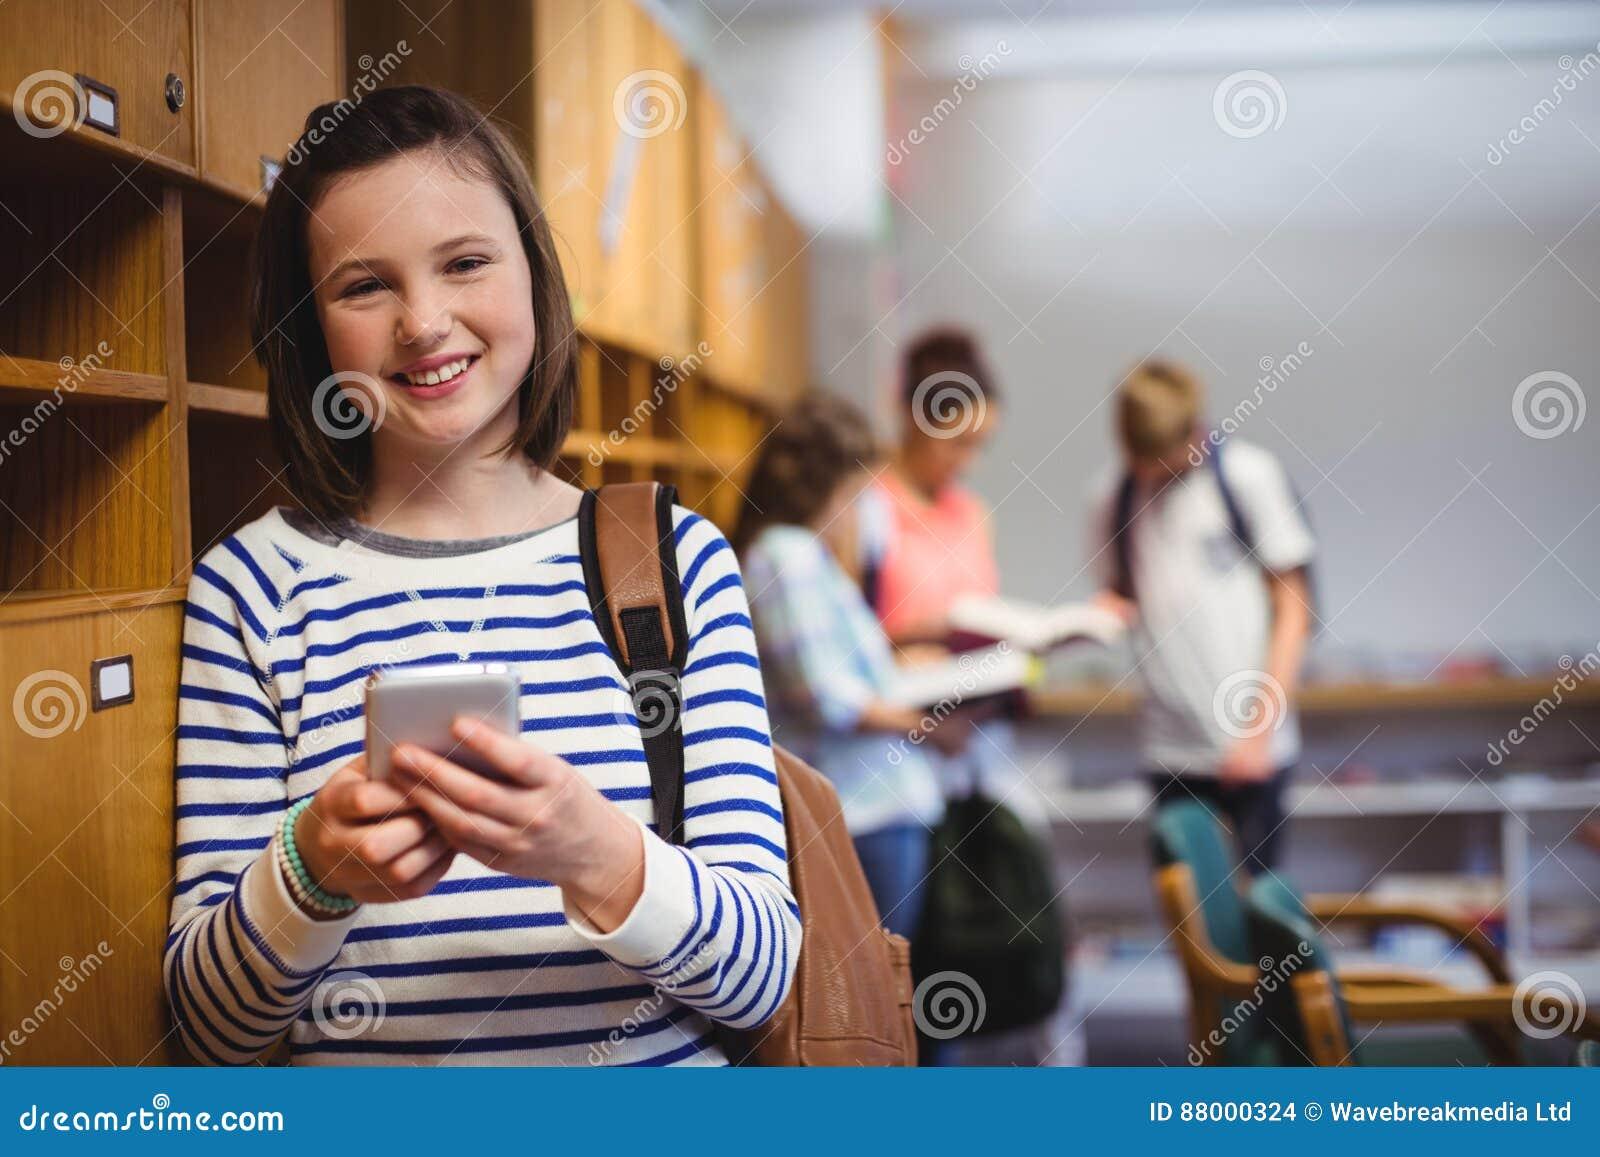 фото в раздевалке школьниц